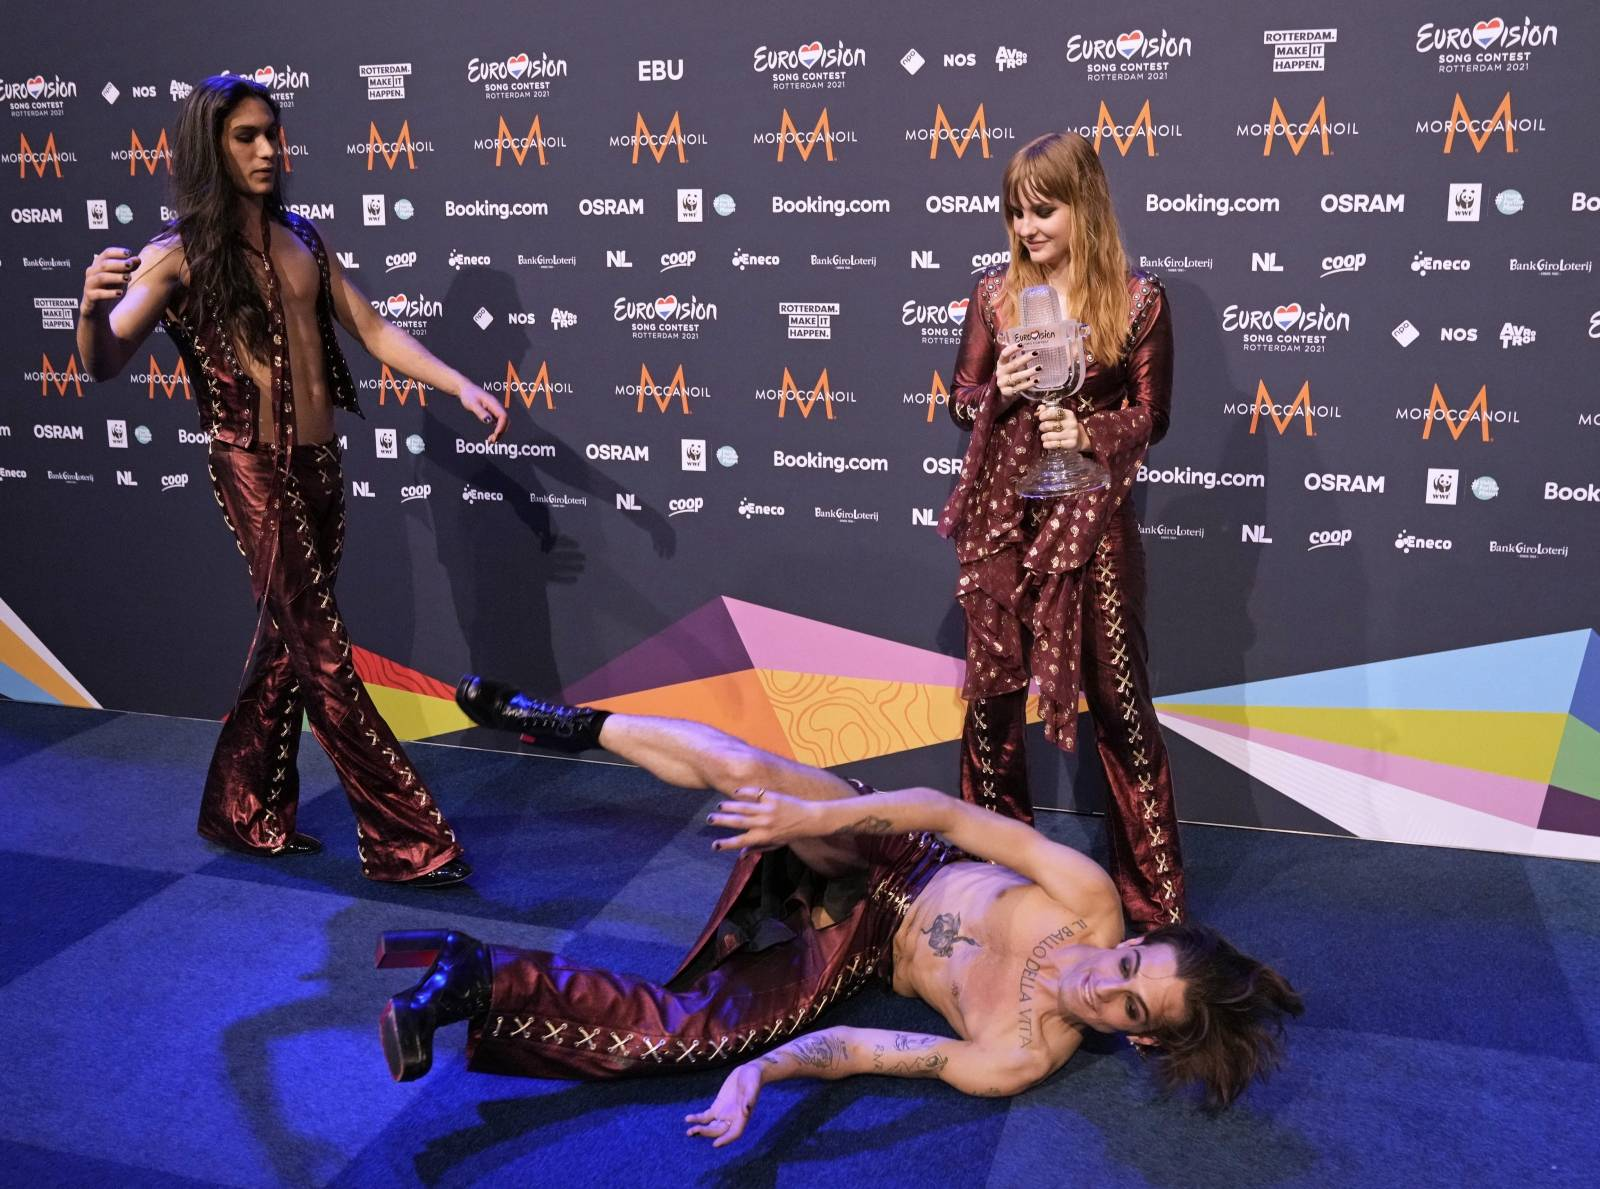 Winner Euro Vision Songcontest 2021 - Maneskin uit Italie - Rotterdam